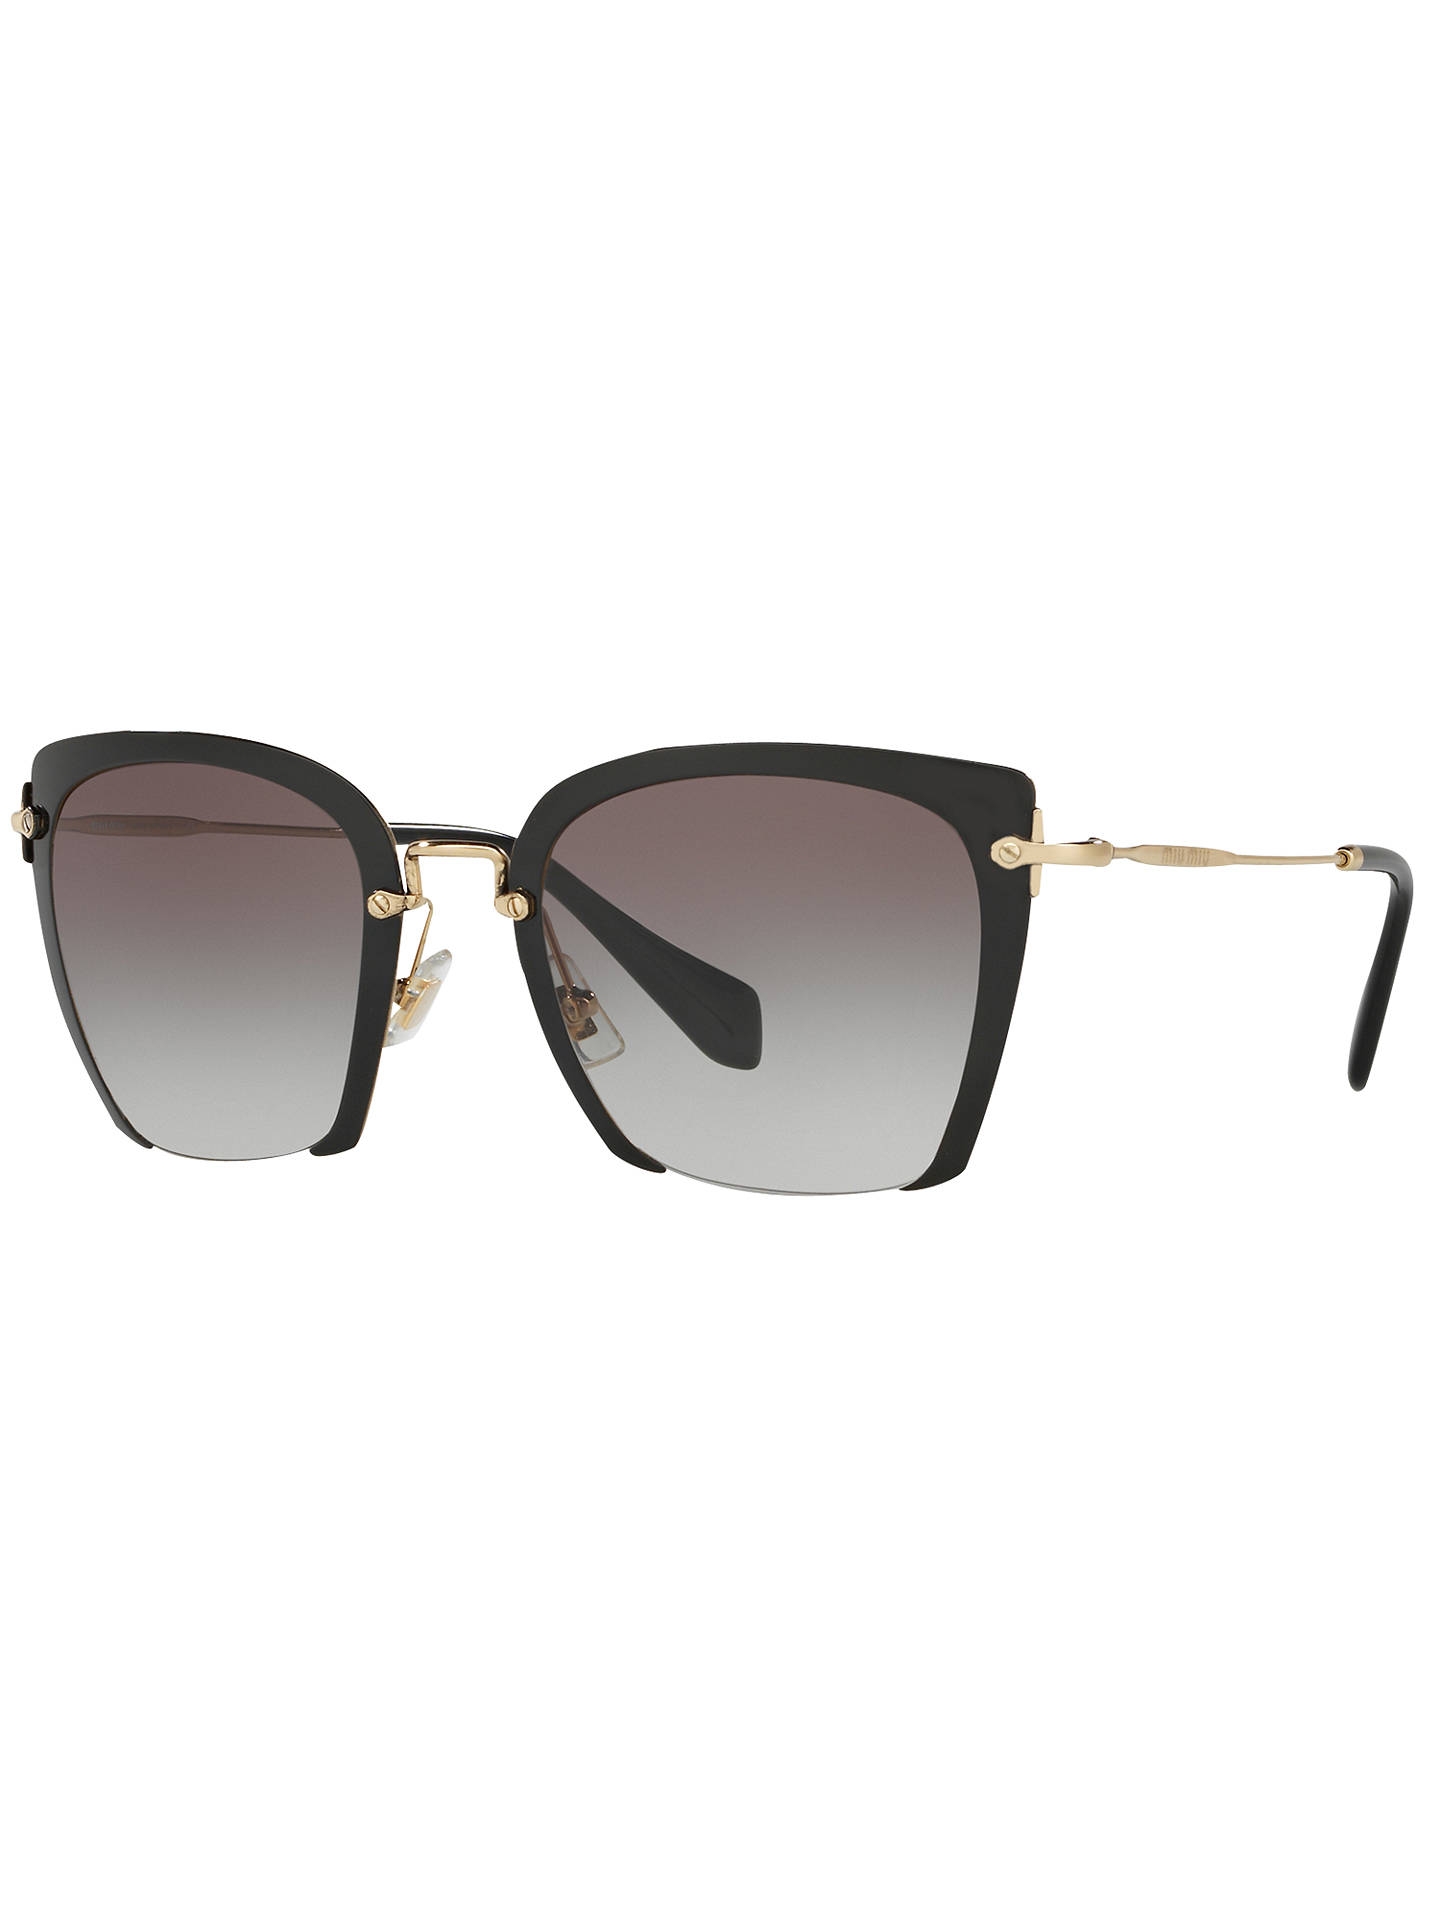 fb9a97902f77 Buy Miu Miu MU52RS Women's Square Sunglasses, Black/Grey Gradient Online at  johnlewis.